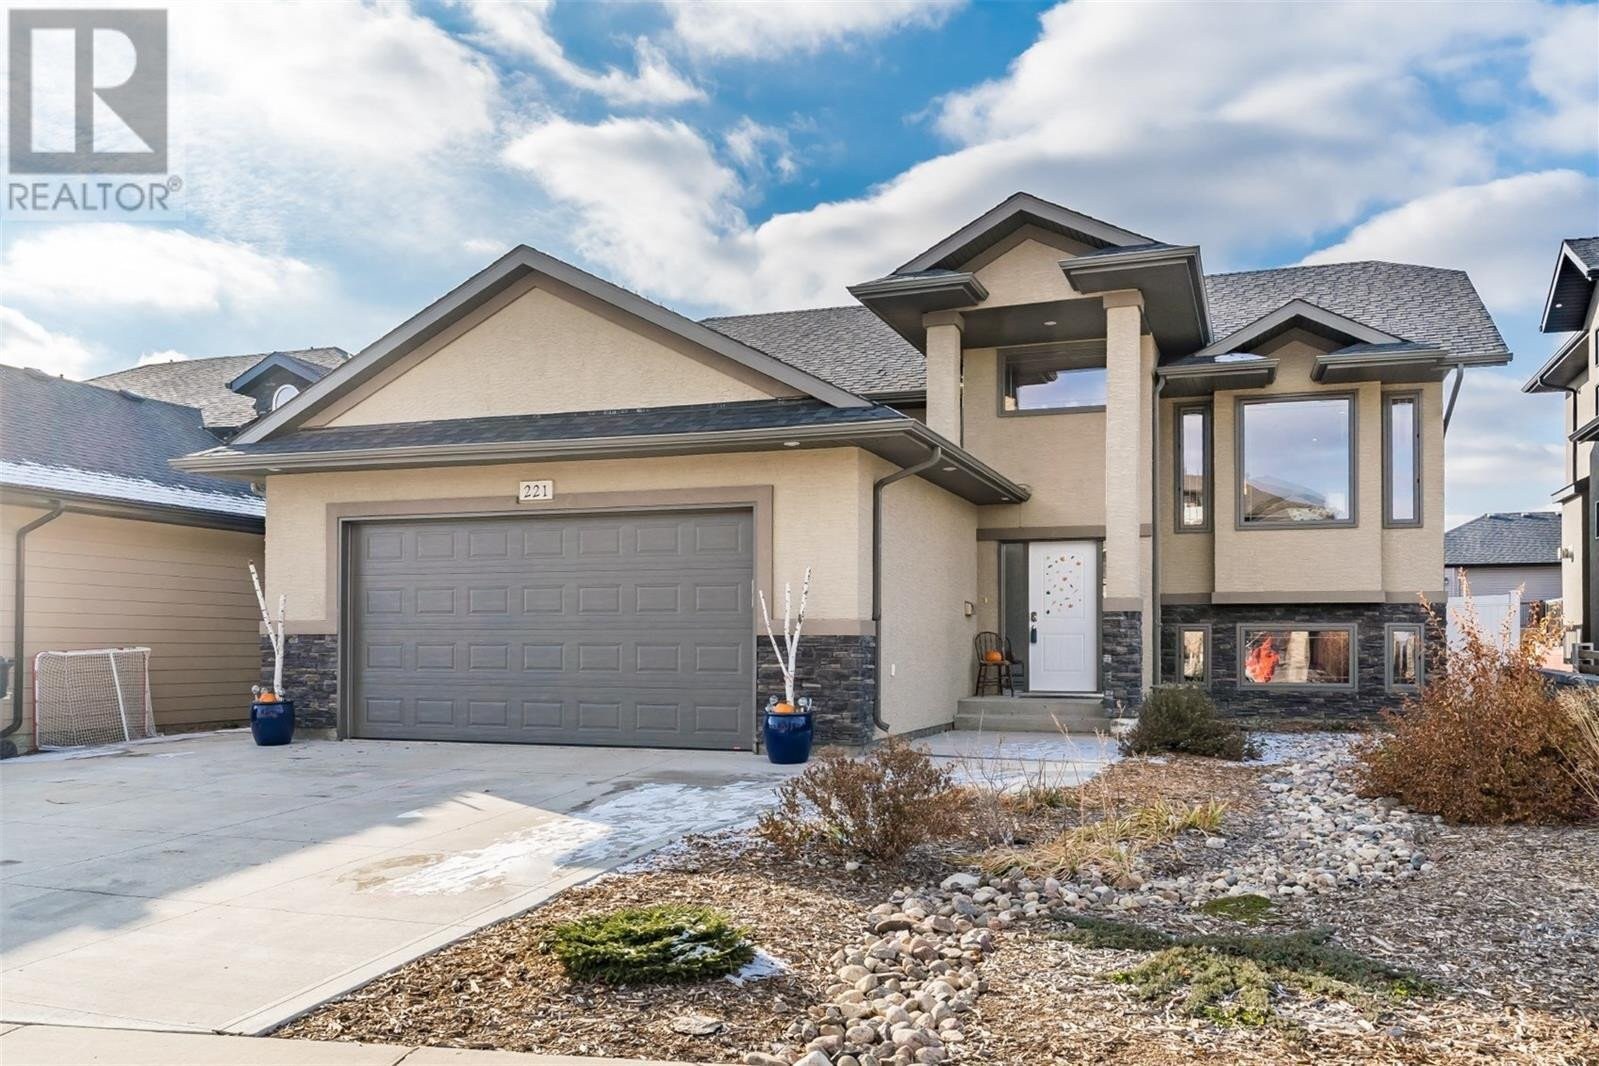 House for sale at 221 Augusta Dr Warman Saskatchewan - MLS: SK831137